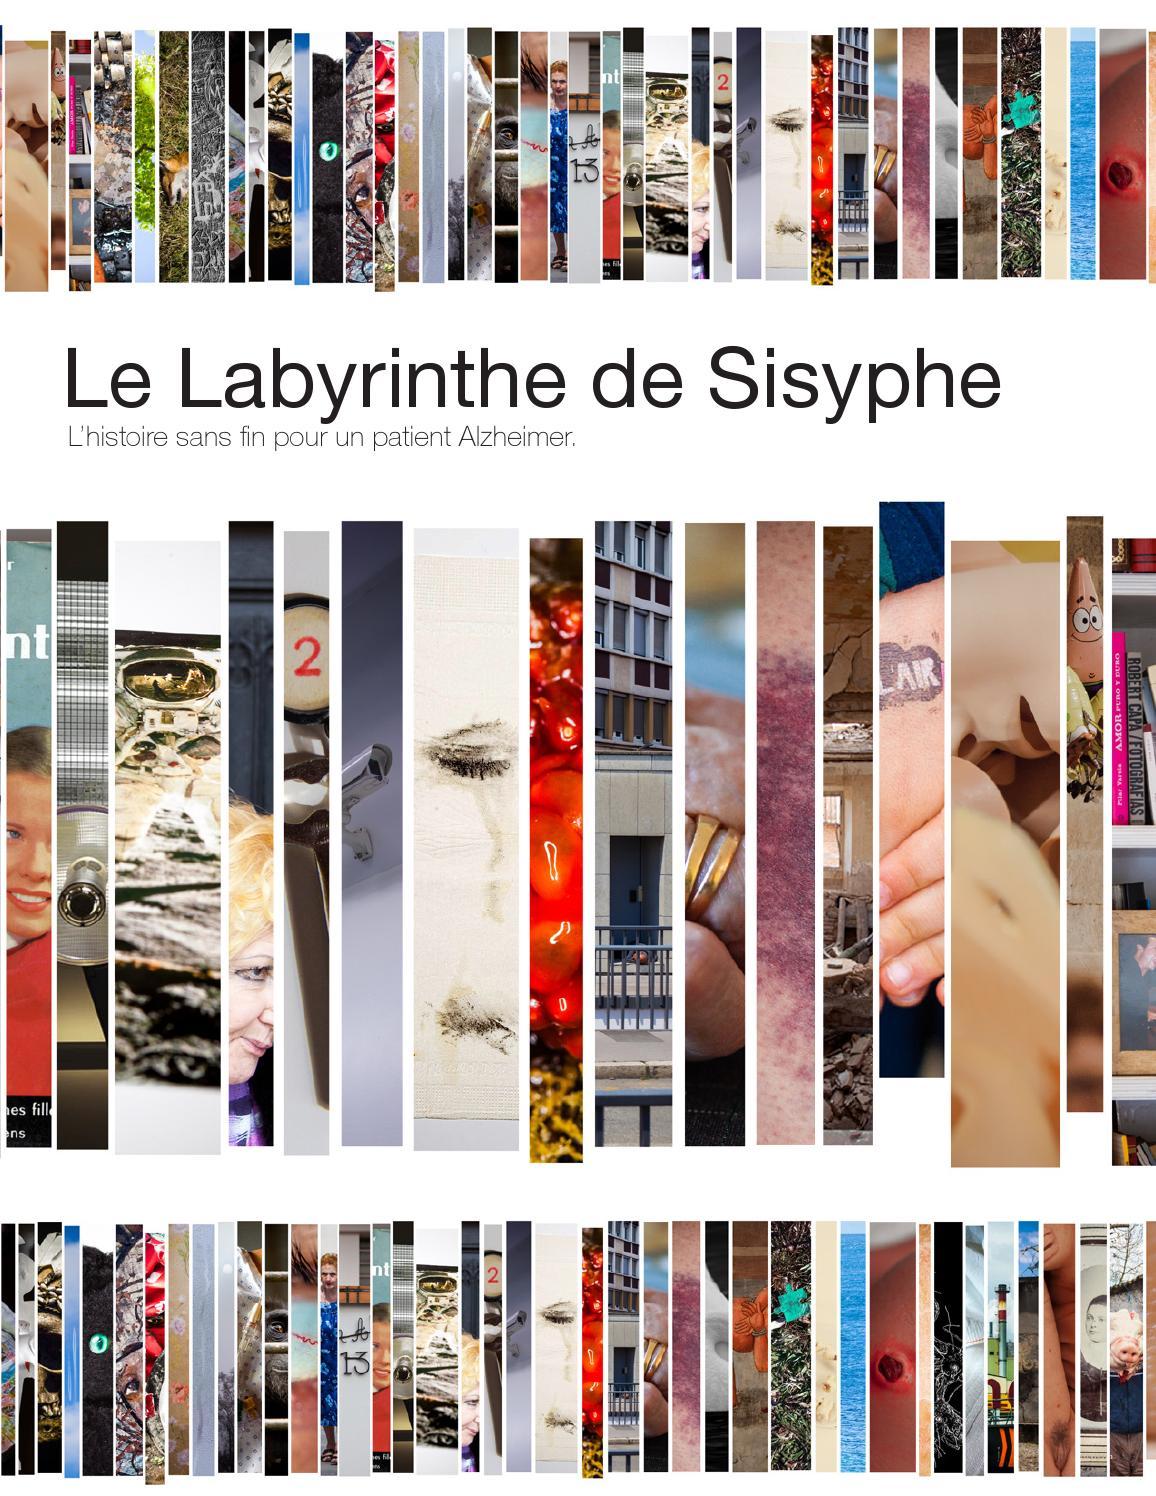 395b7d71e45a29 Le Labyrinthe de Sisyphe by LEJEAILLE - issuu